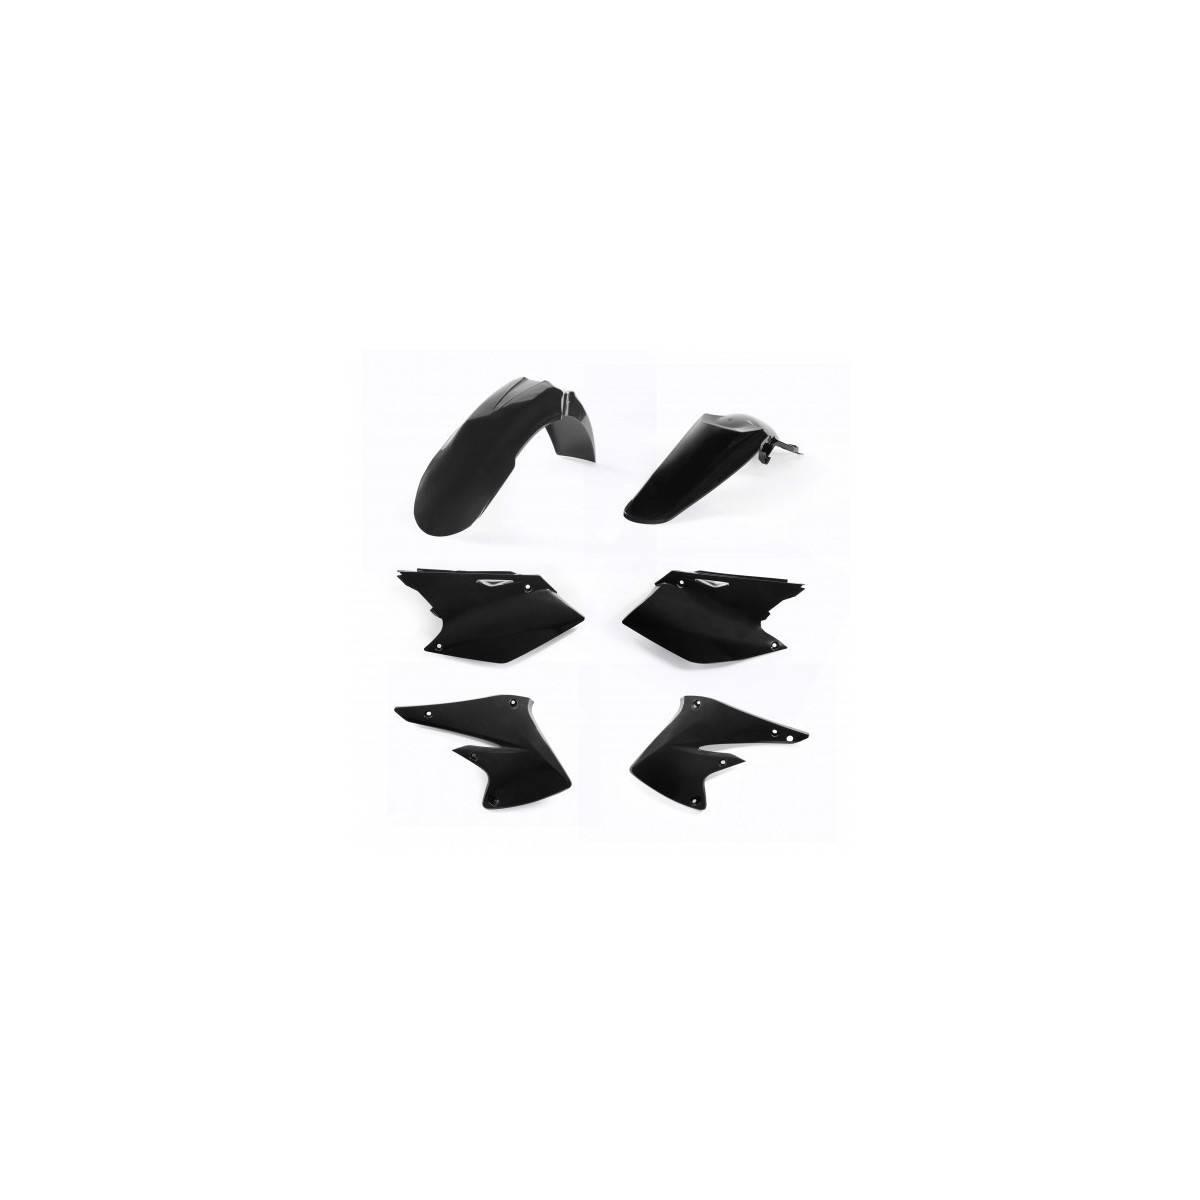 0017703-090 - Kit Plasticos Te Fe 14 16 Negro